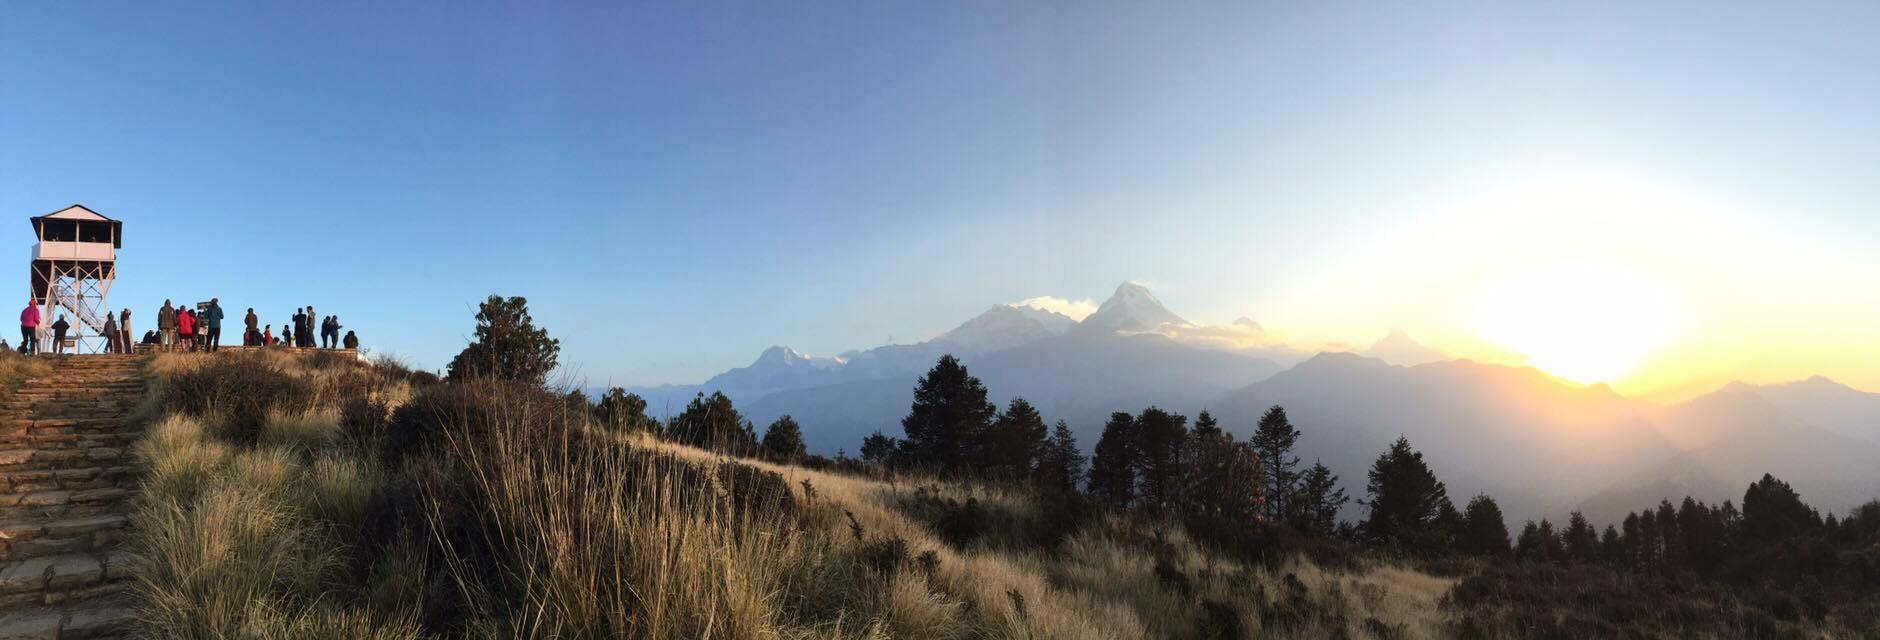 Annapurna Poonhill Trek